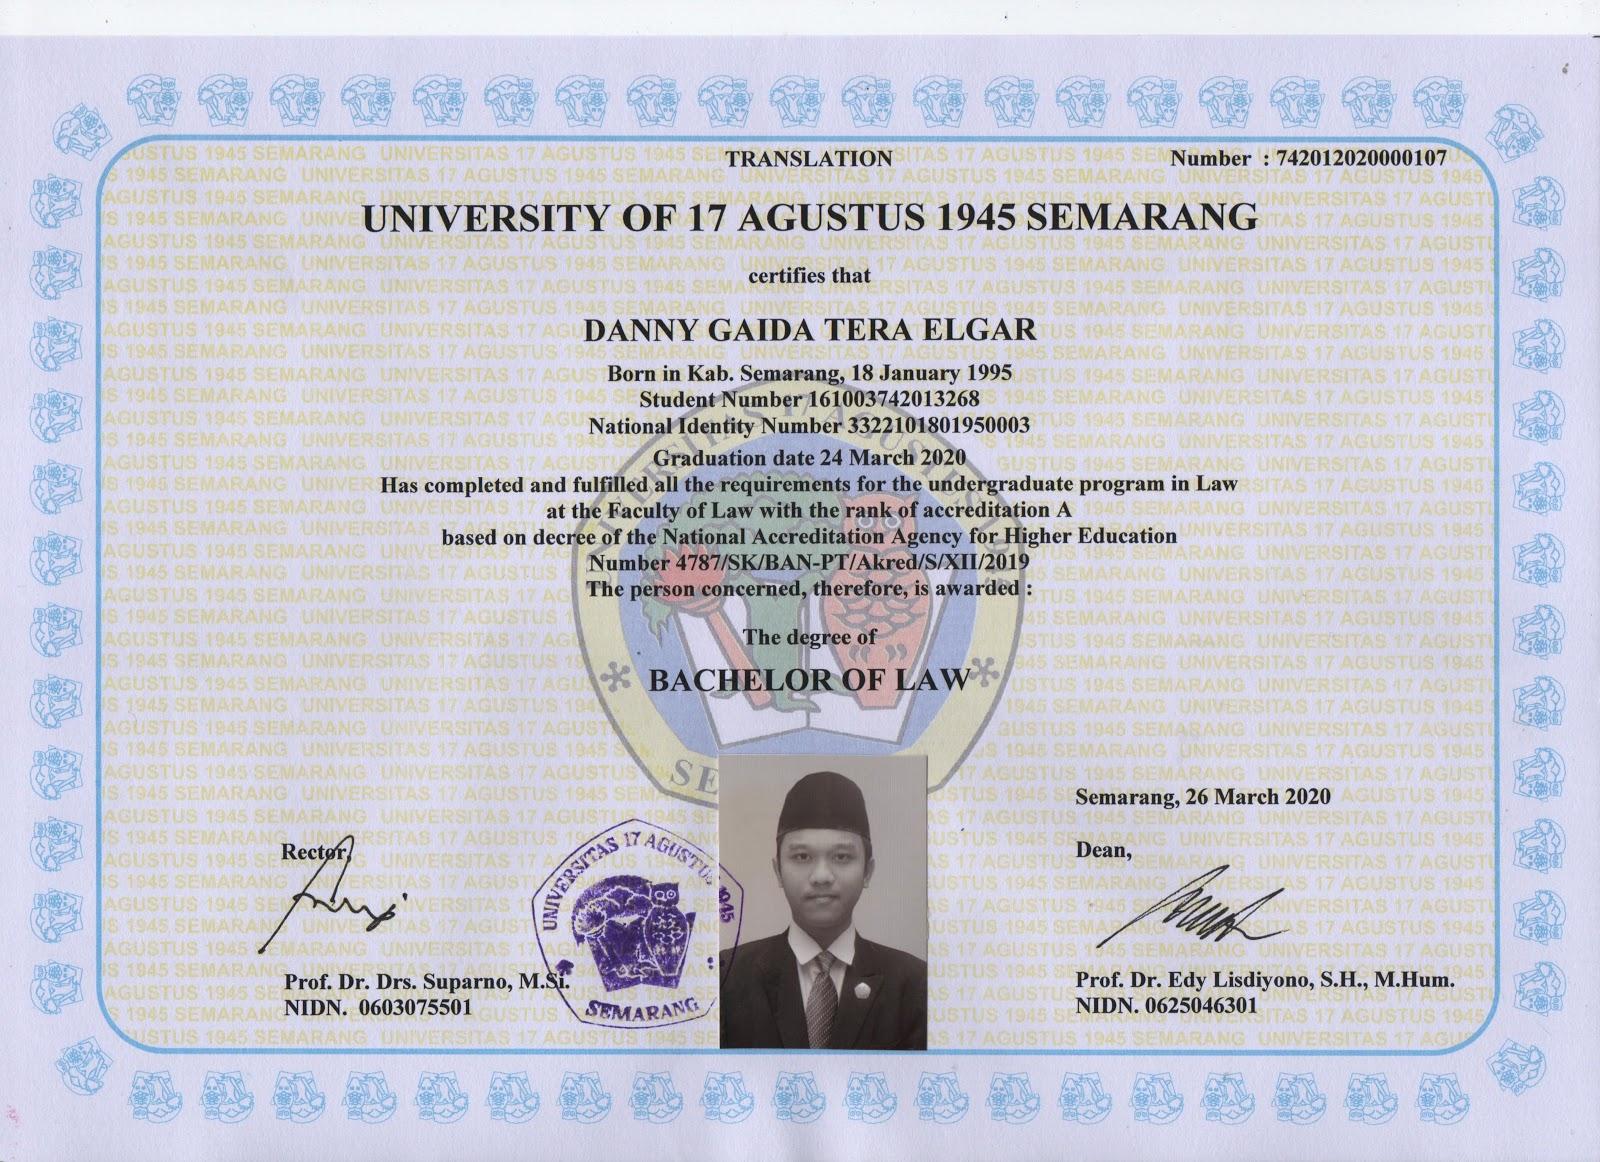 Ijazah Sarjana (S1) Fakultas Hukum Universitas 17 Agustus 1945 (UNTAG) Semarang | Versi Bahasa Inggris (English Language) | Bachelor Of Law